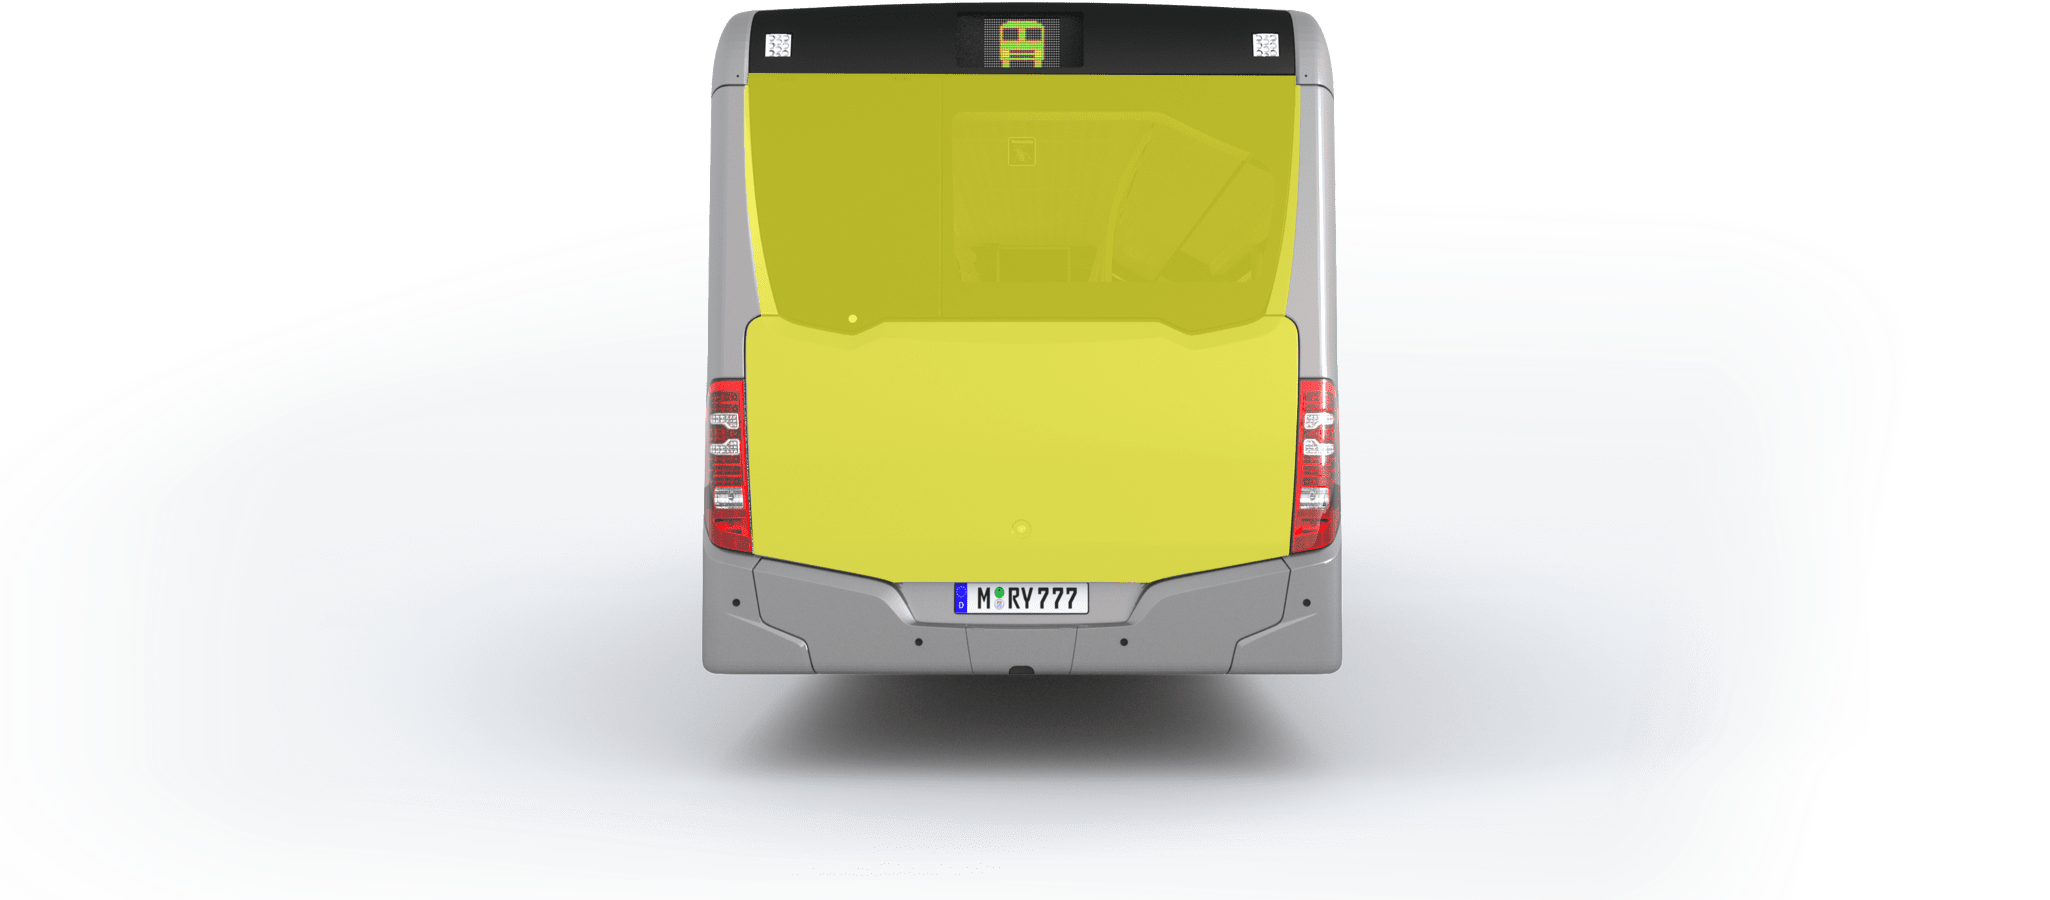 05_KWS-Buswerbung-XXL-Heckflaechenwerbung